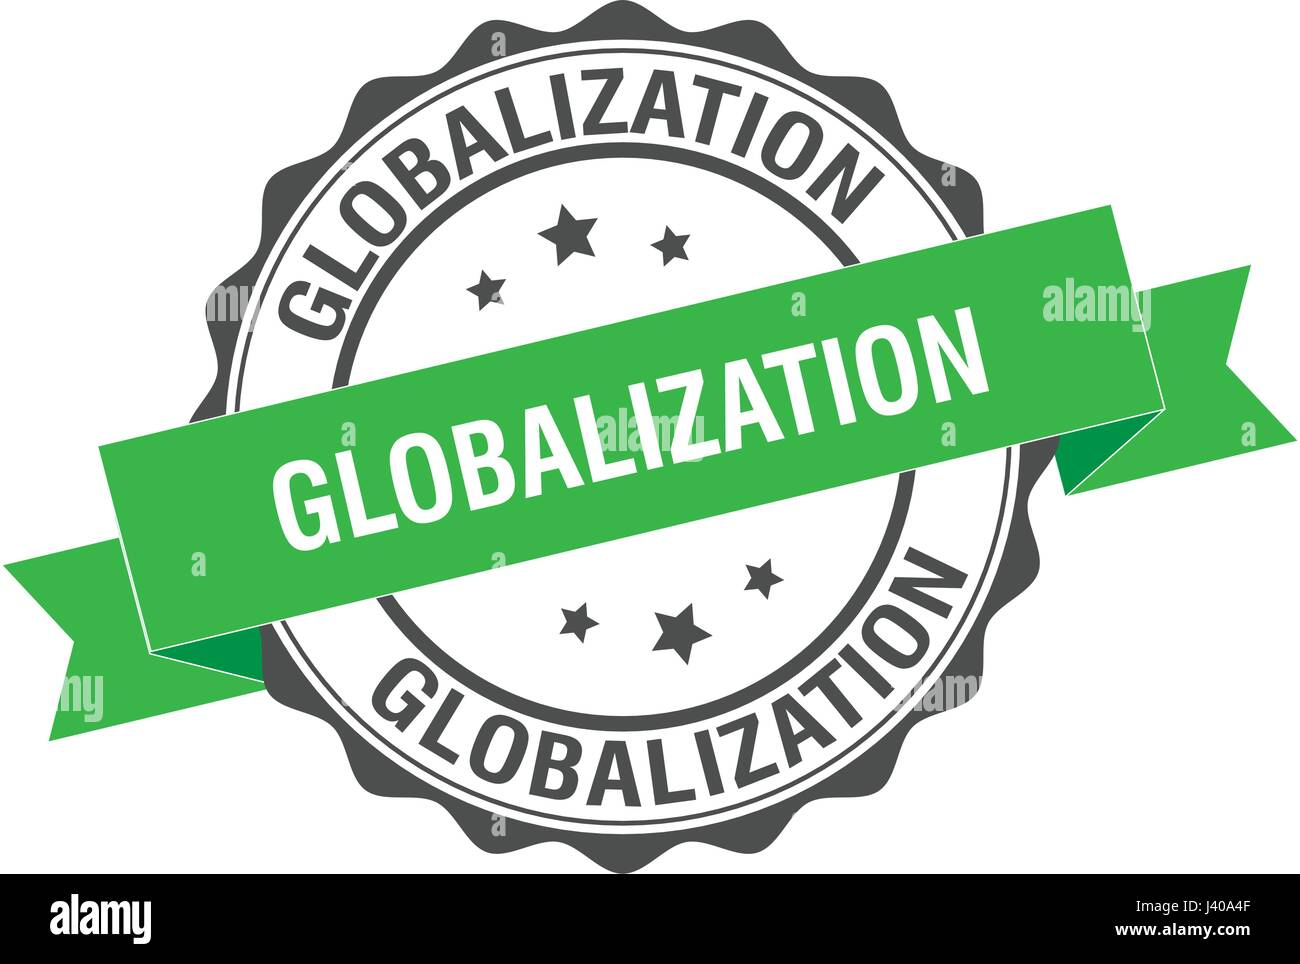 Globalization stamp illustration - Stock Image